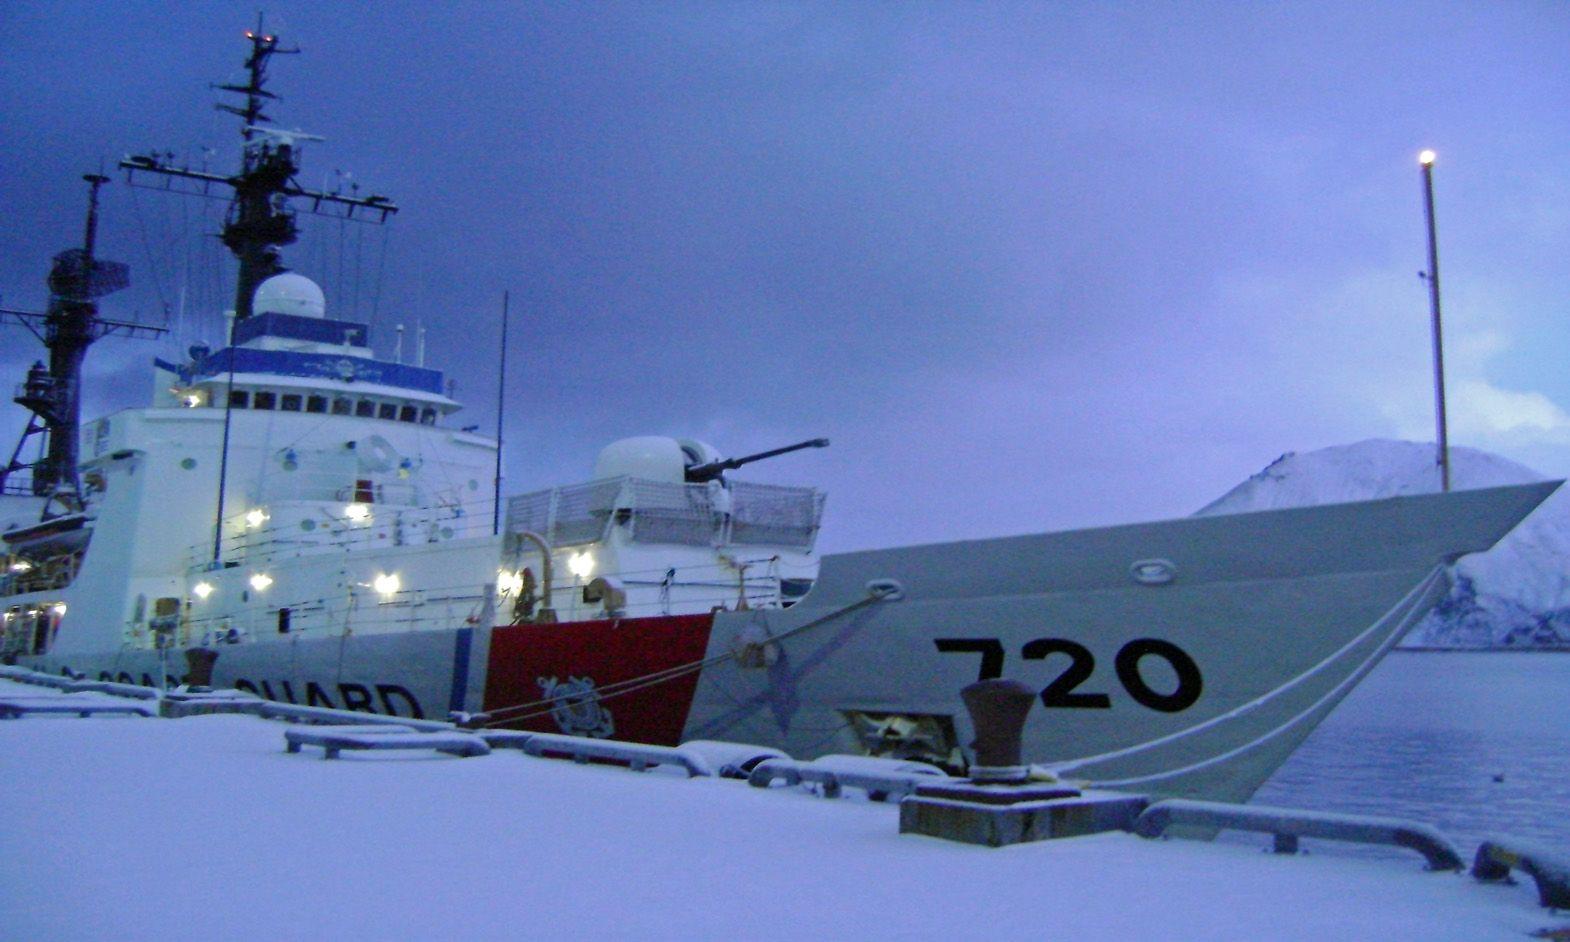 Troop Co Coast Guard Railway DIECAST MODEL WHY US COASTGUARD ...